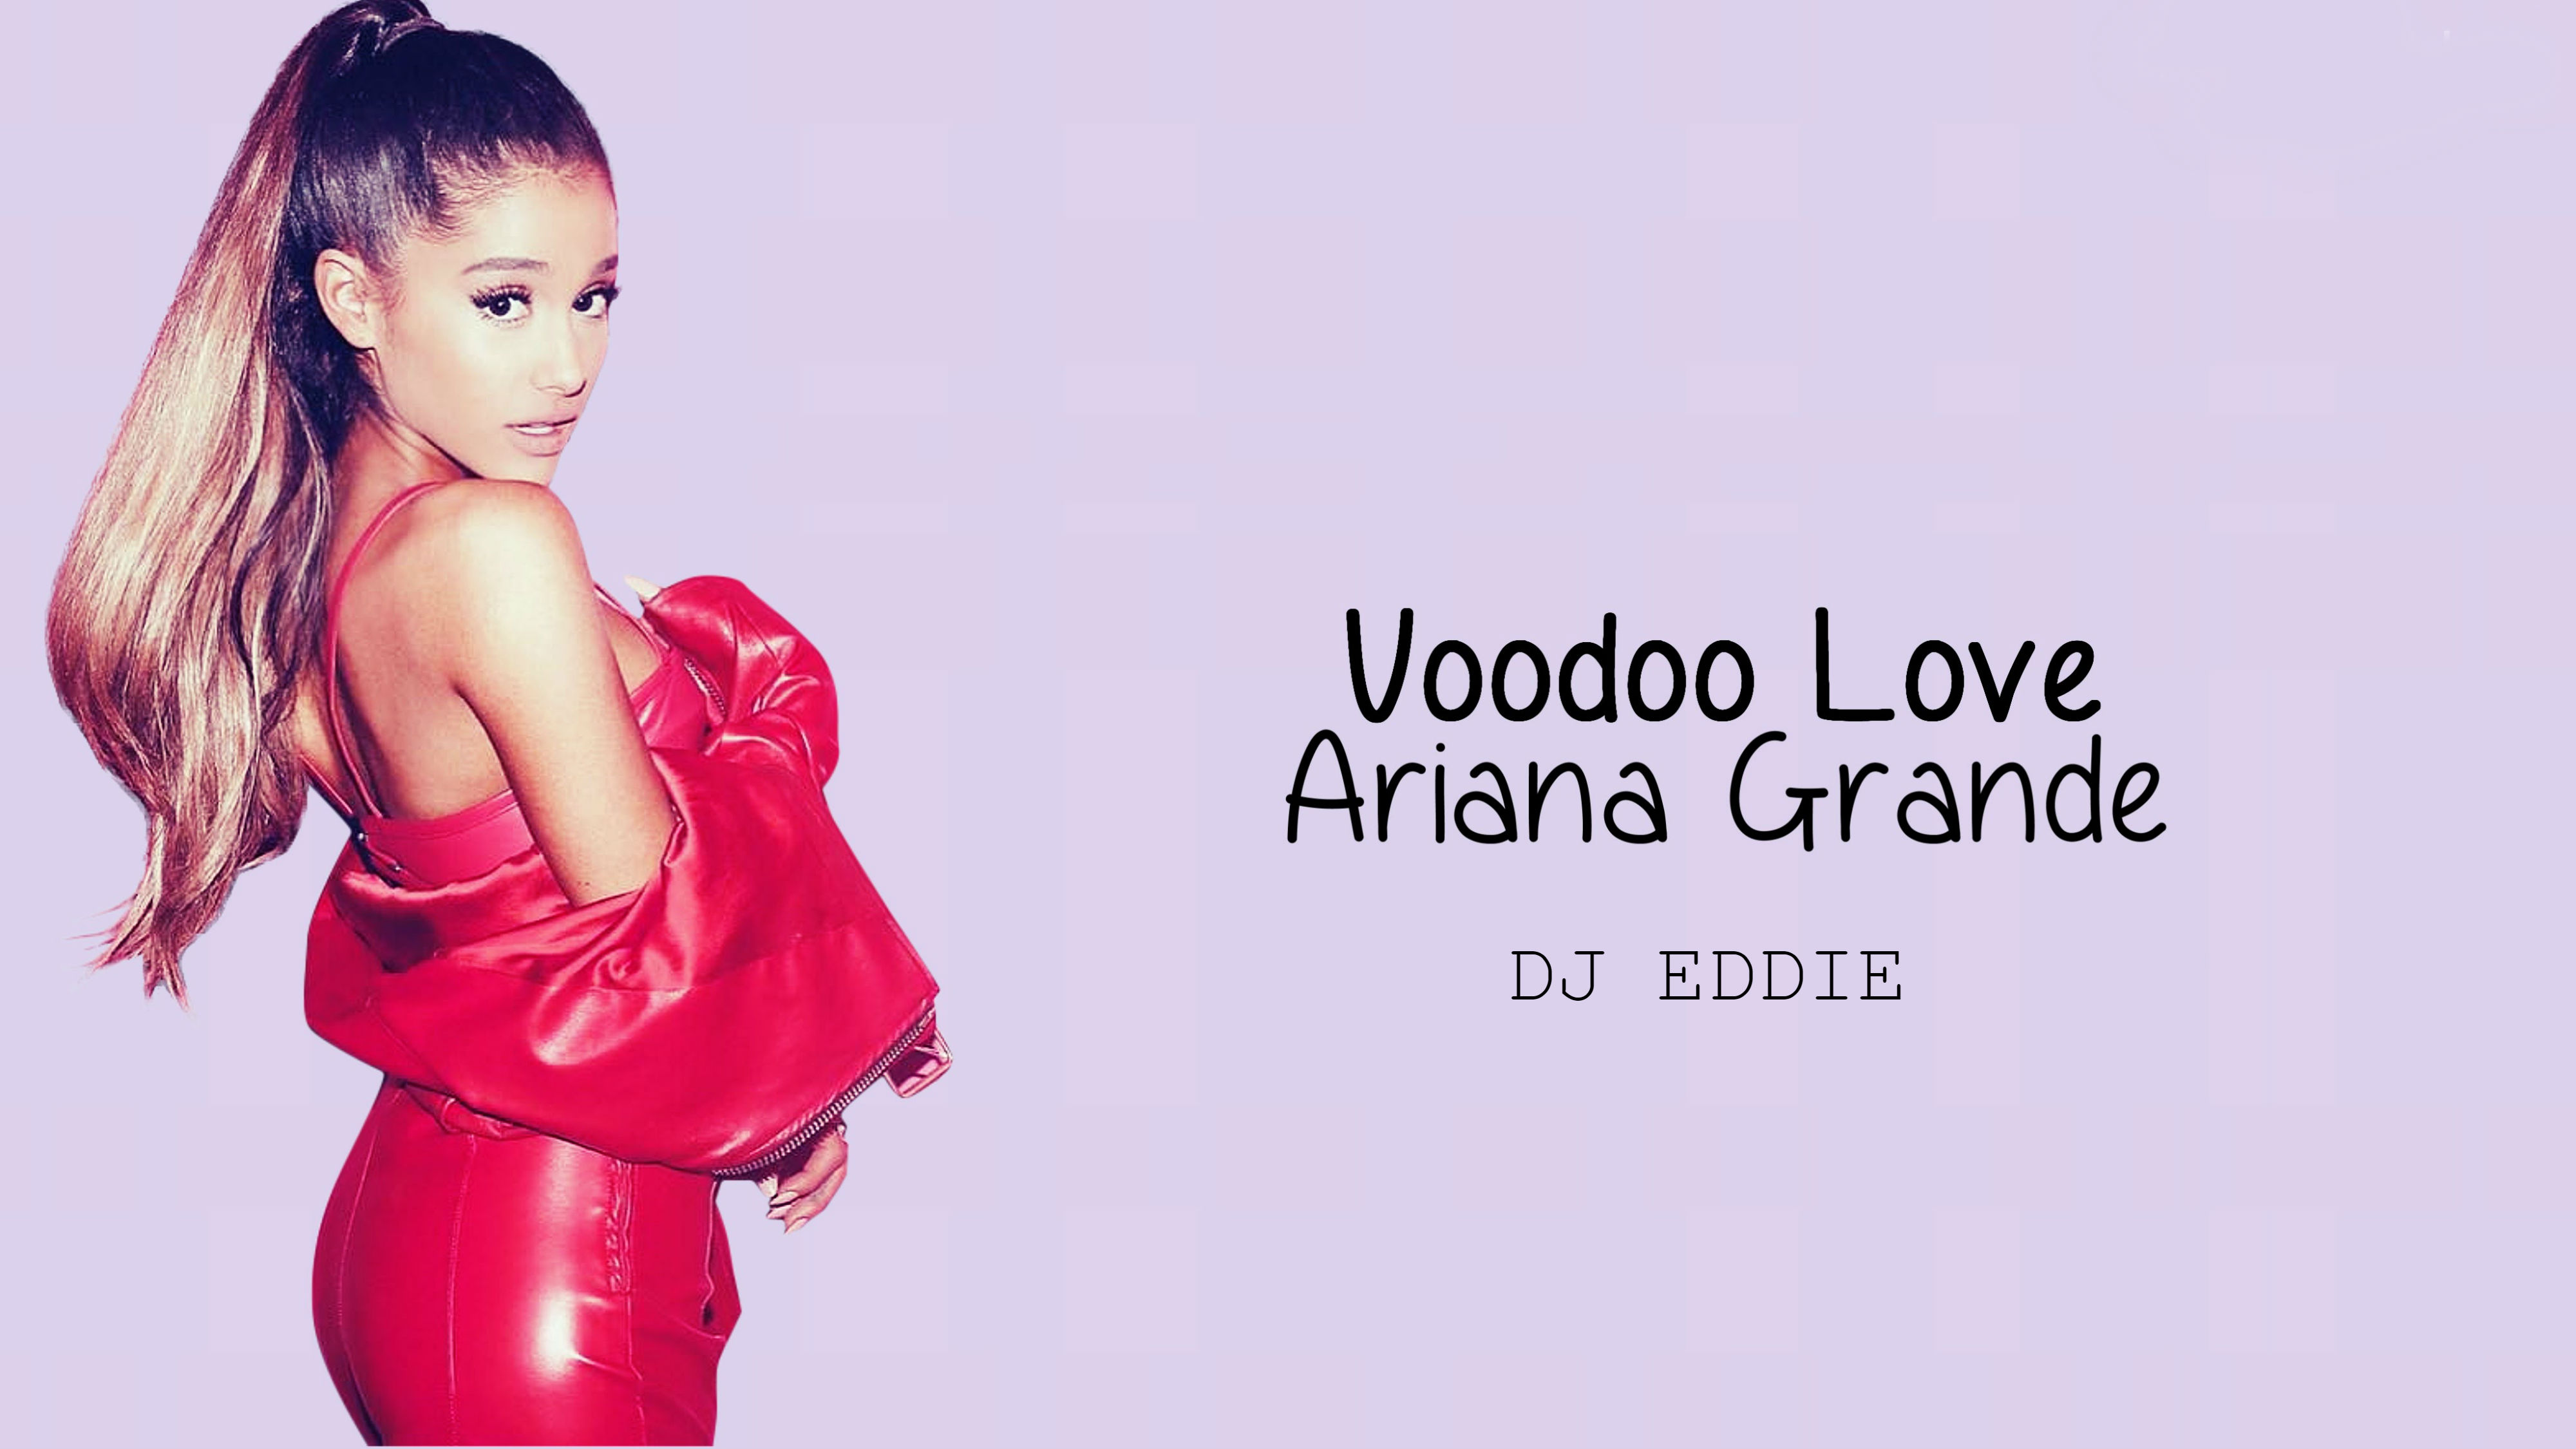 Ariana Grande - Voodoo Love